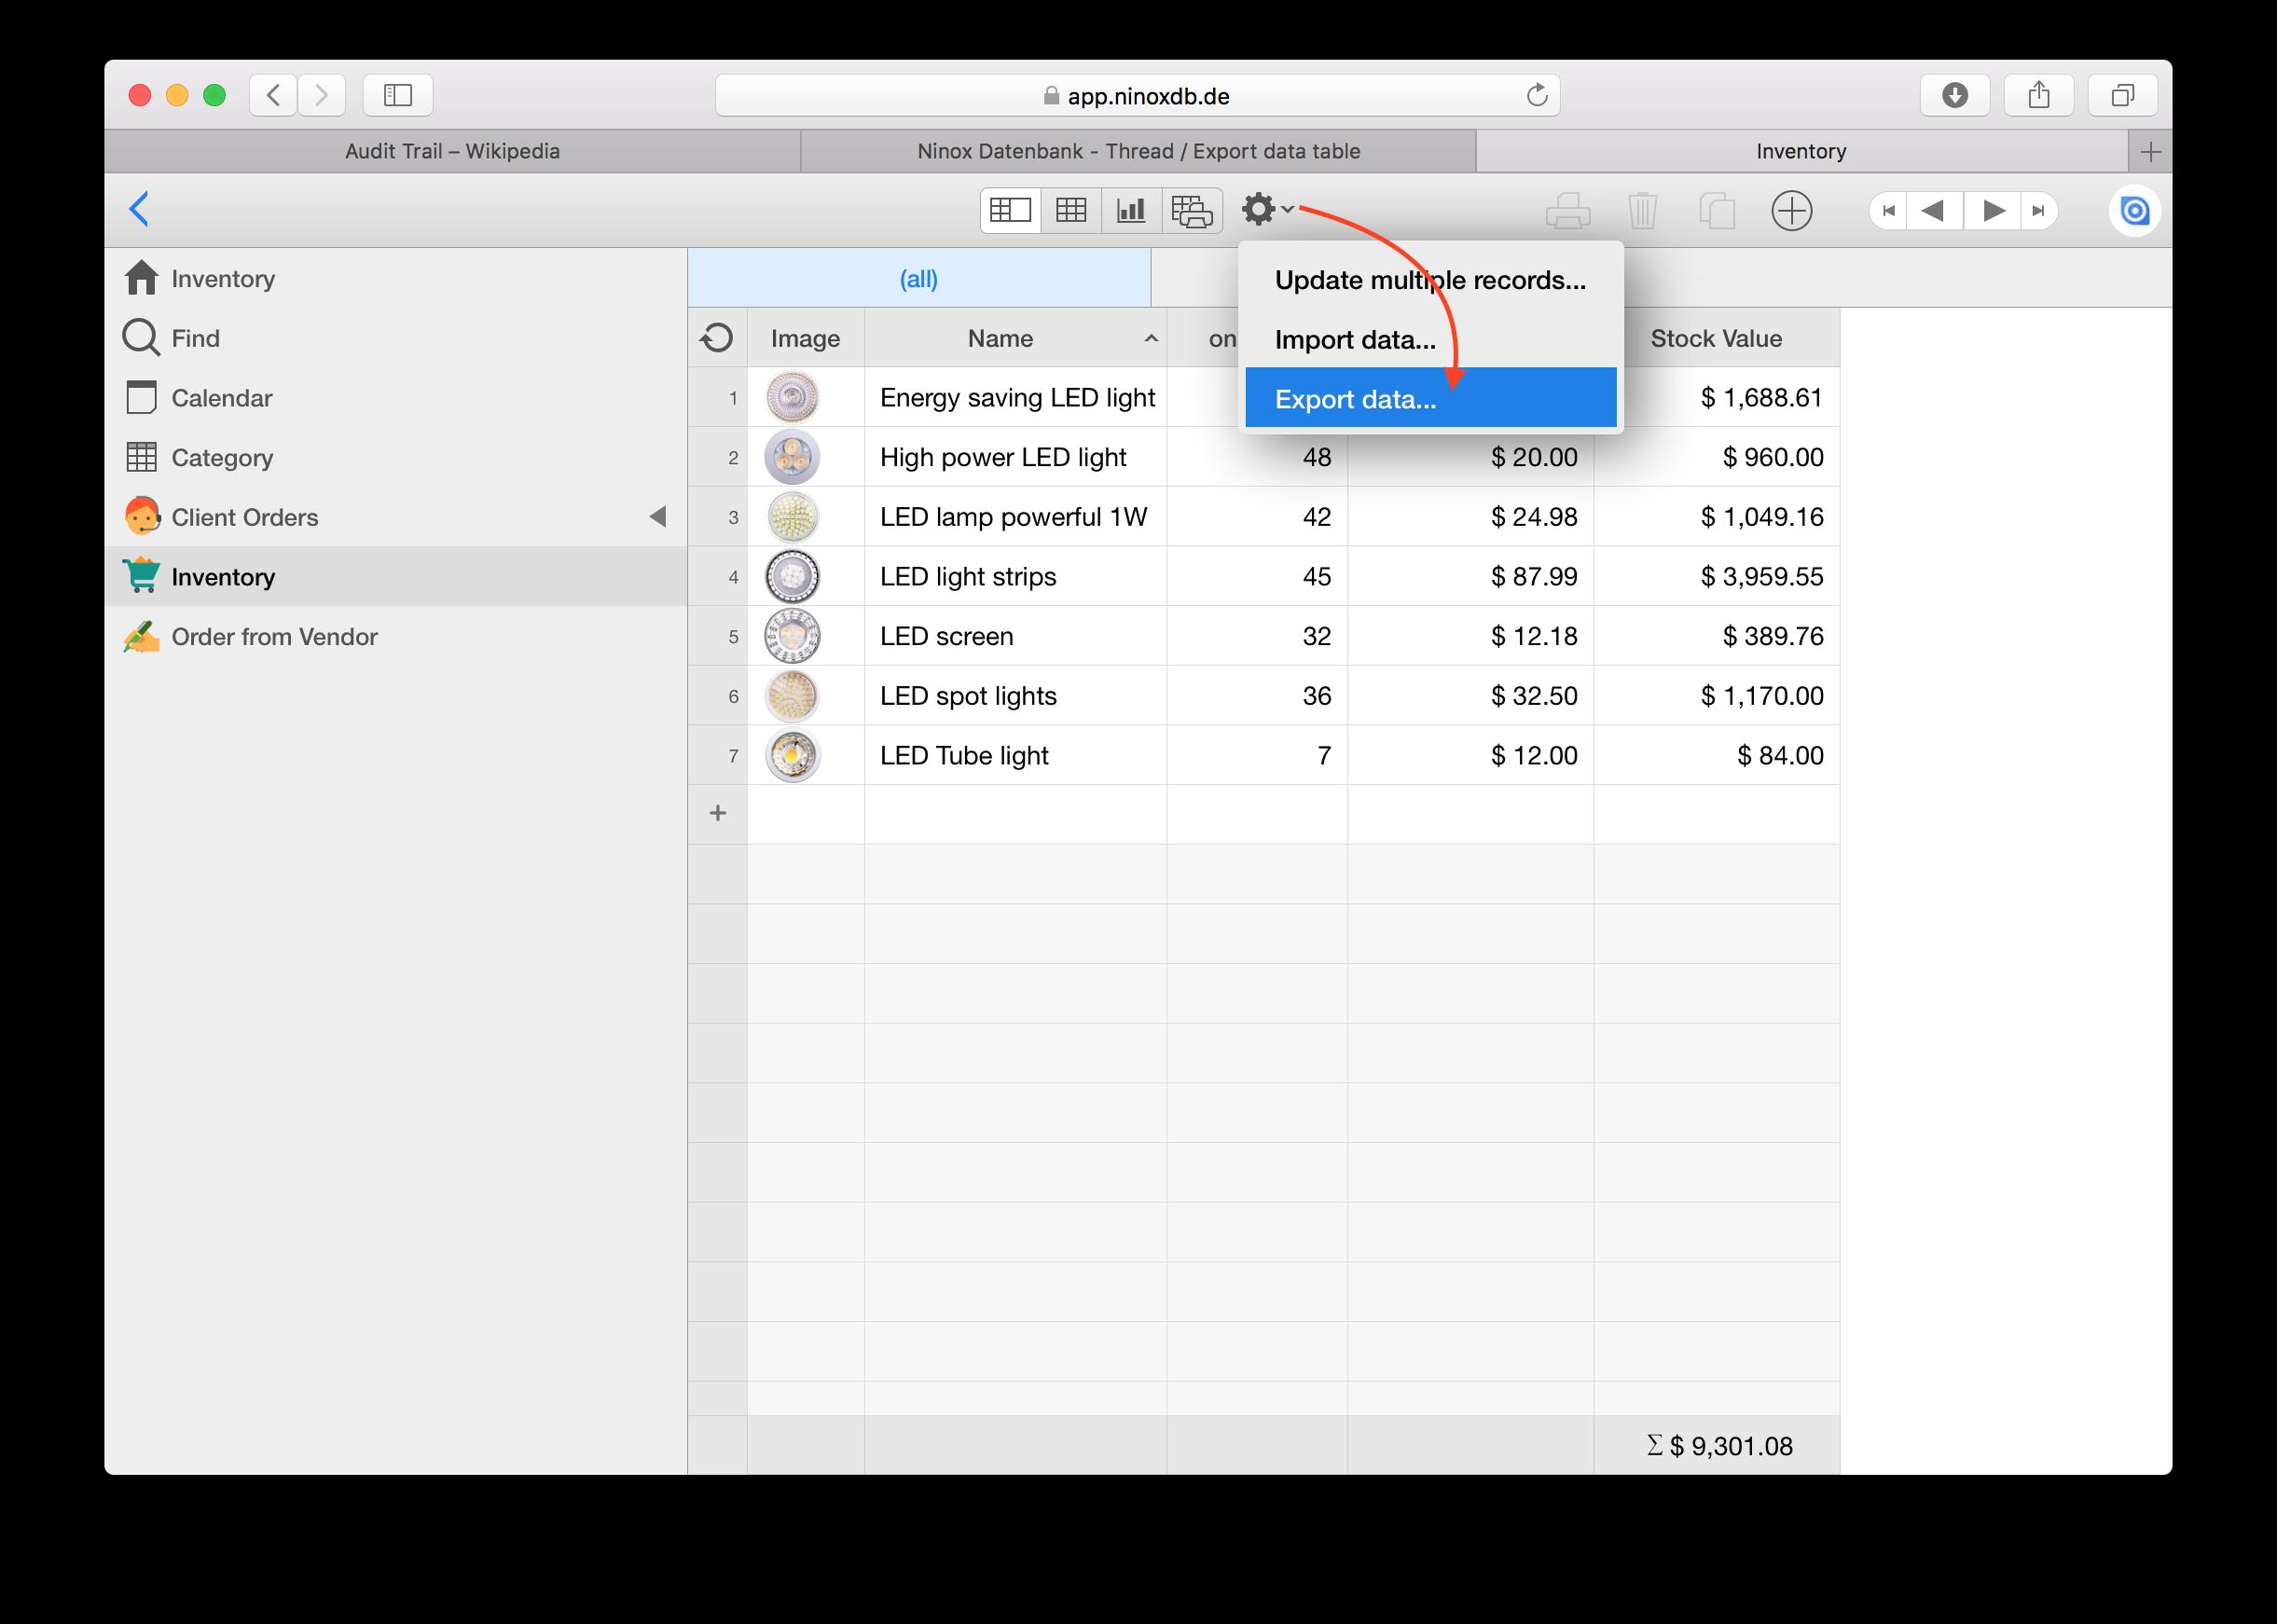 Ninox Database - Thread / Export data table